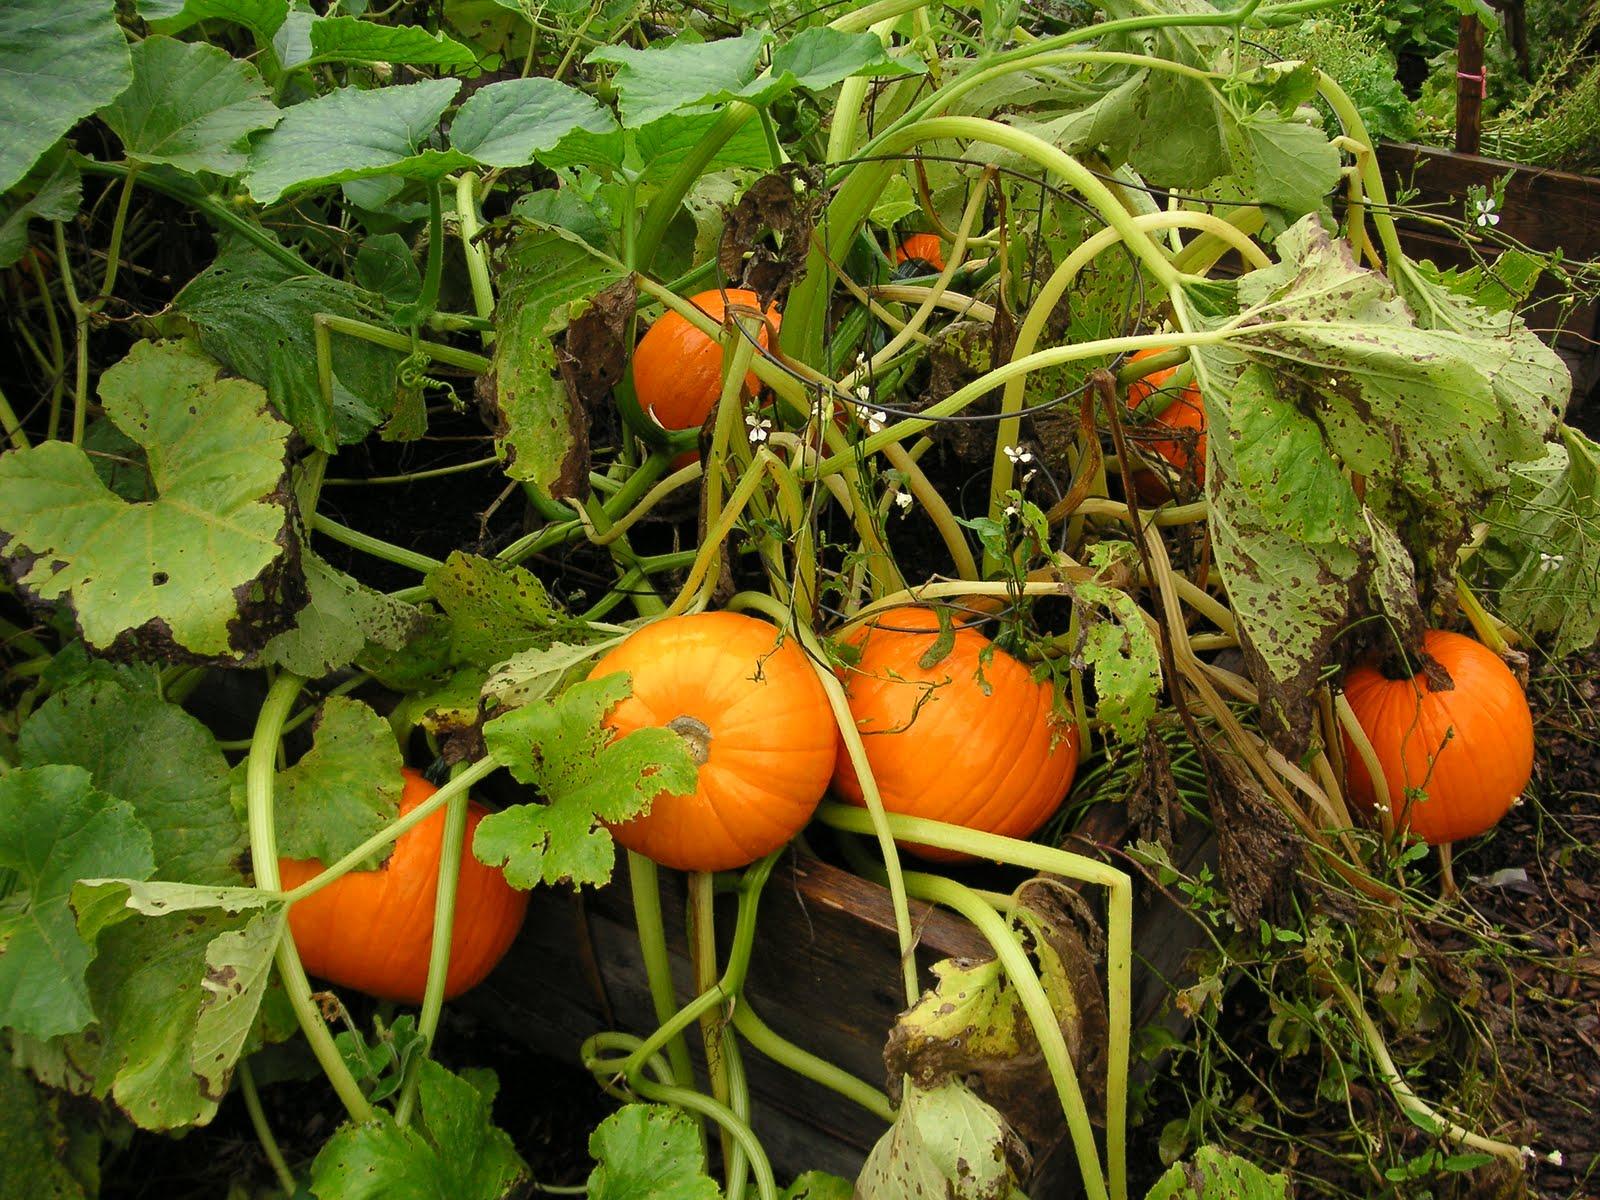 How to grow a pumpkin in your garden